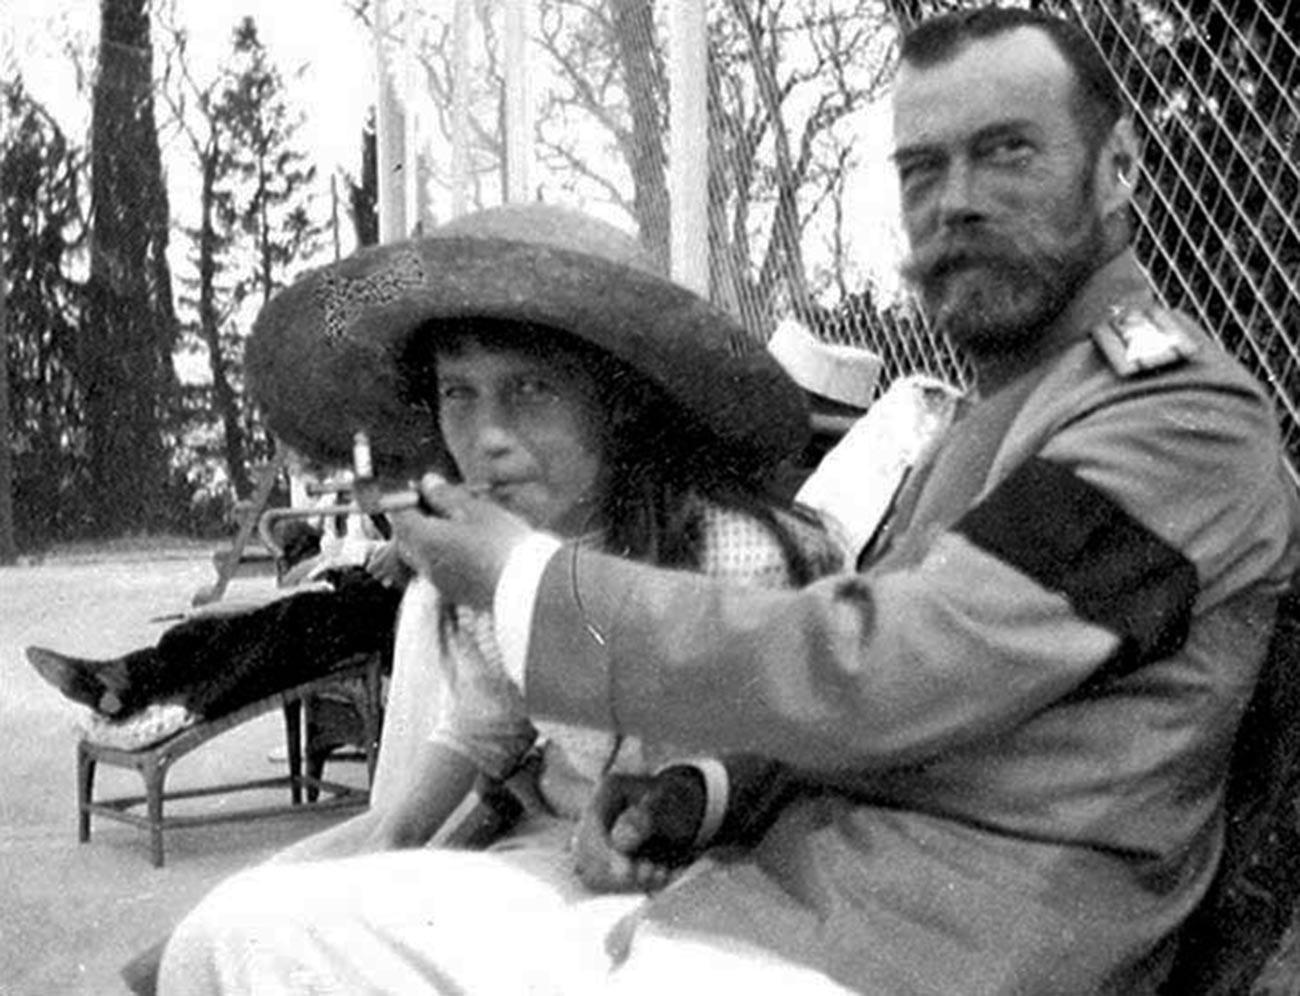 Анастасия и Николай II пушат